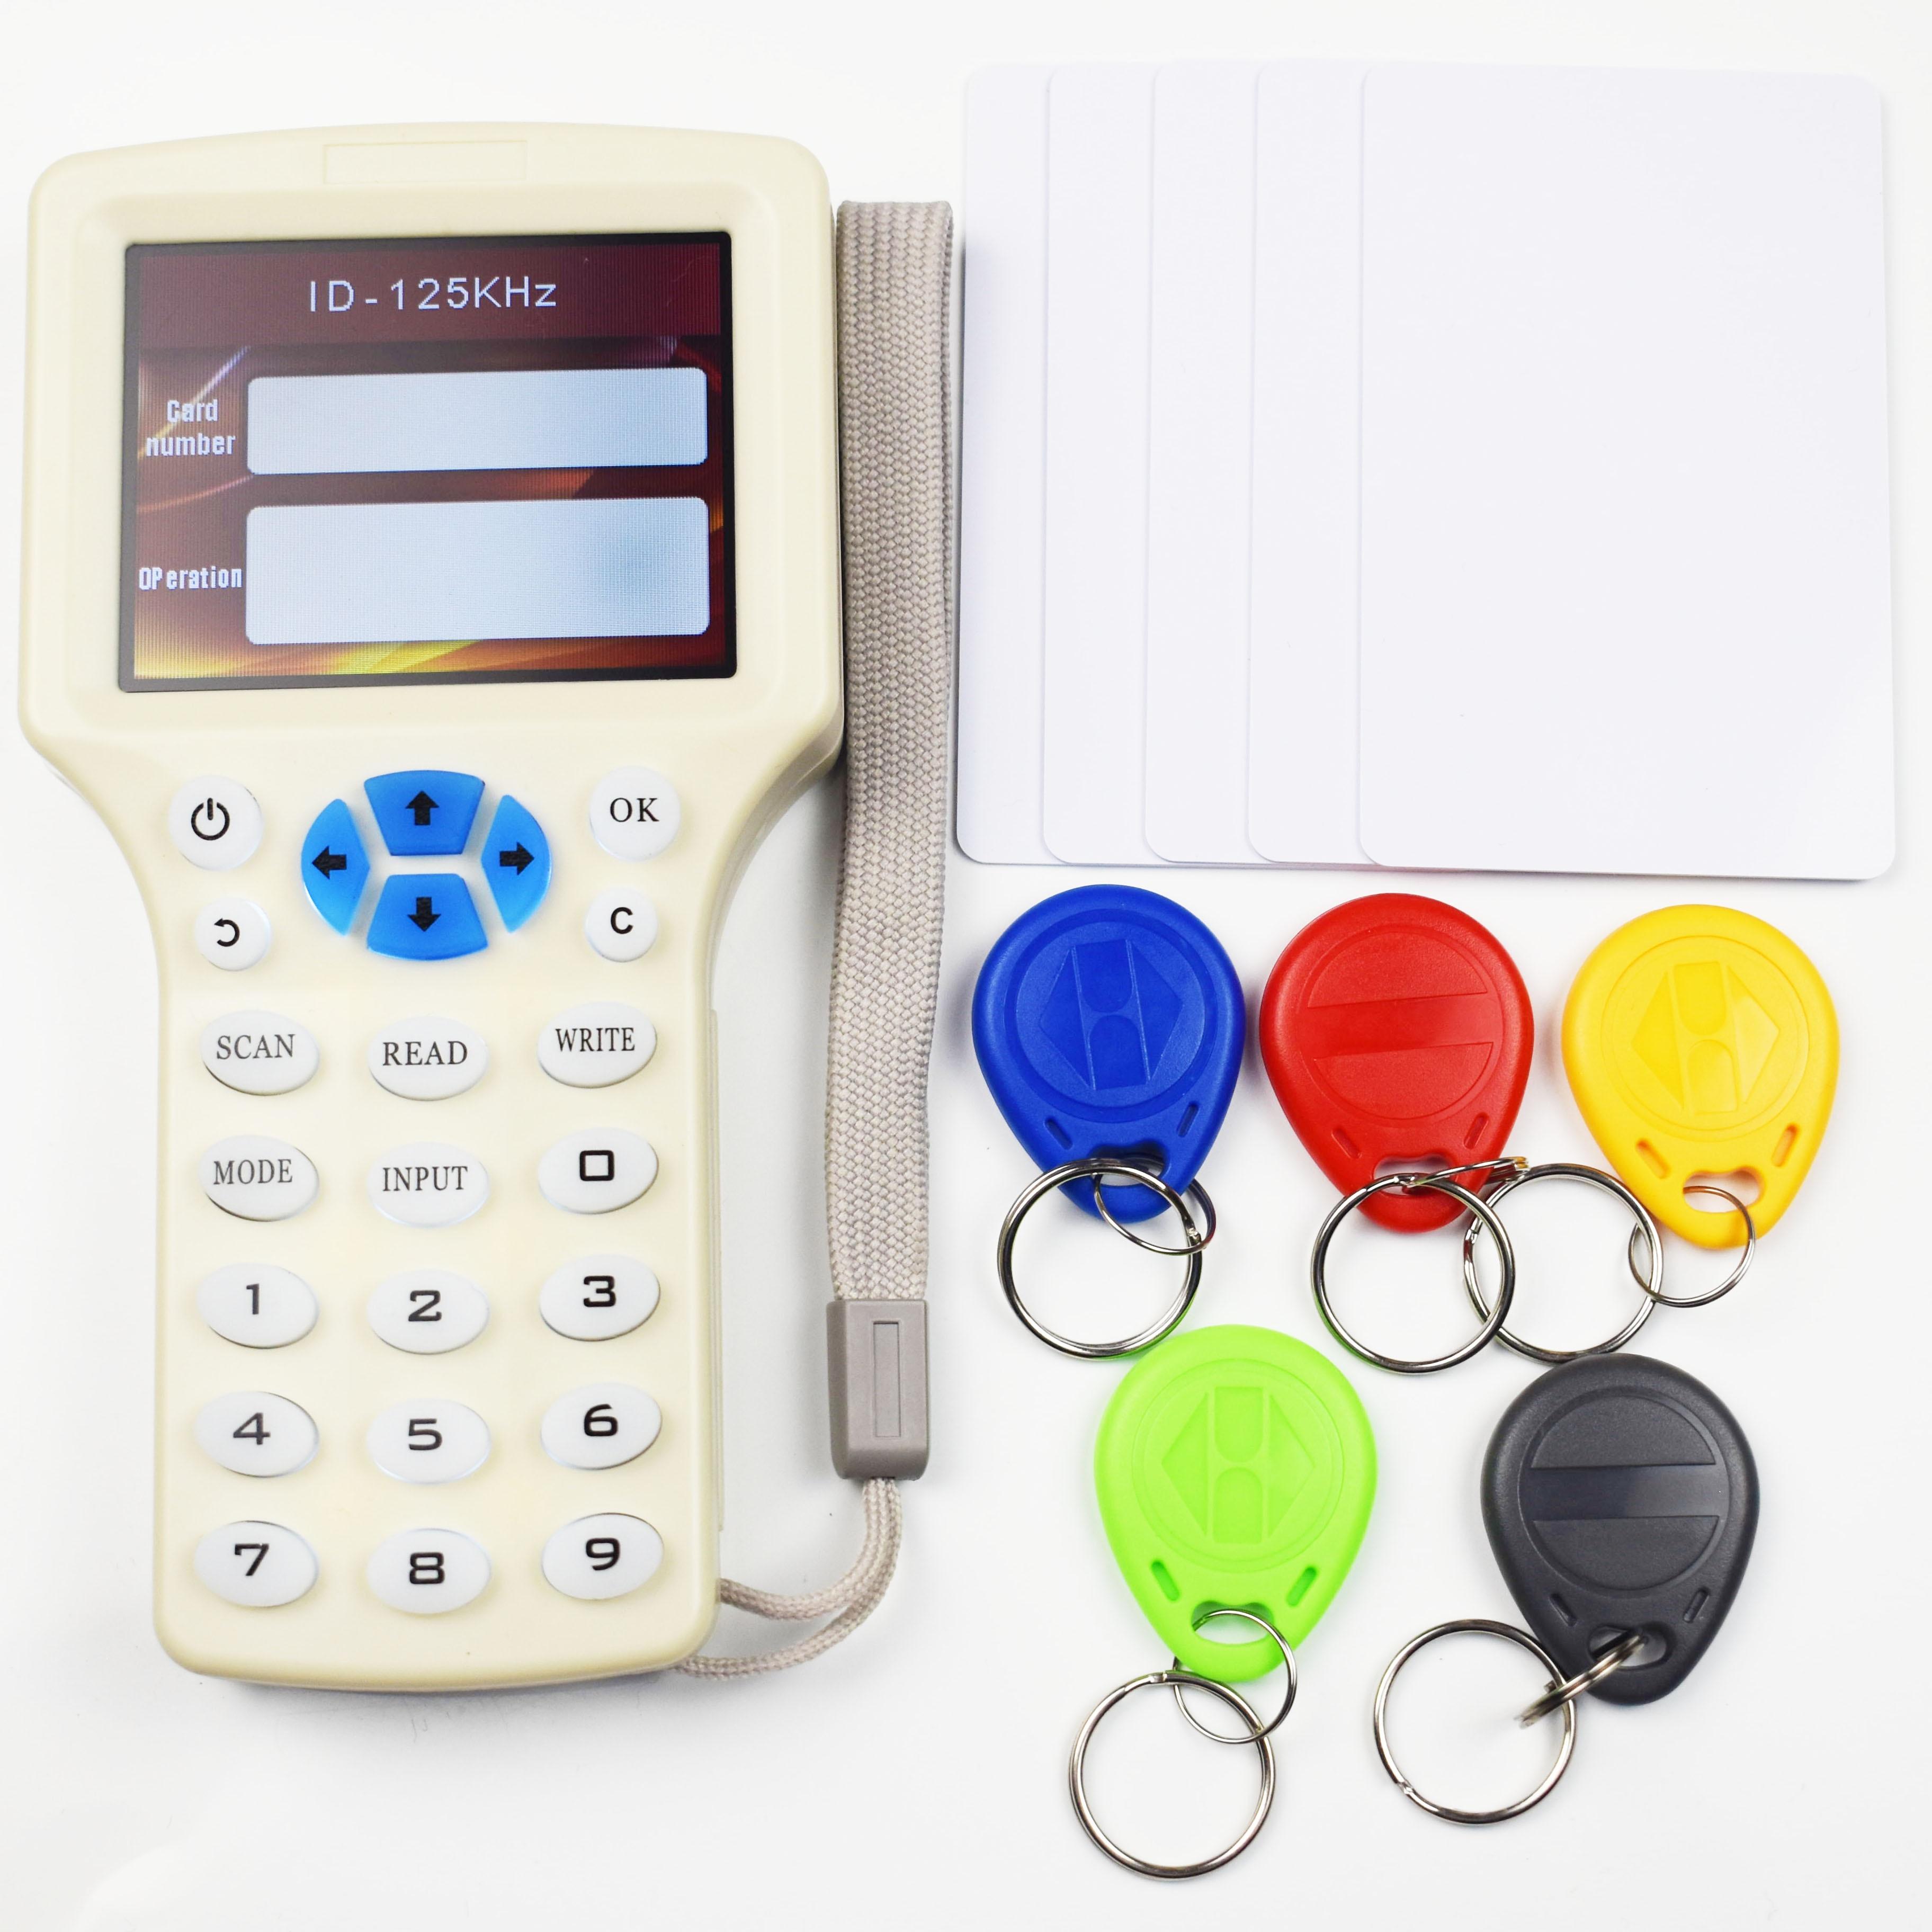 10 English Frequency RFID Copier Duplicator 125KHz Key fob NFC Reader Writer 13.56MHz Encrypted Programmer USB UID Copy Card Tag|rfid copier|ic reader writerreader writer - AliExpress